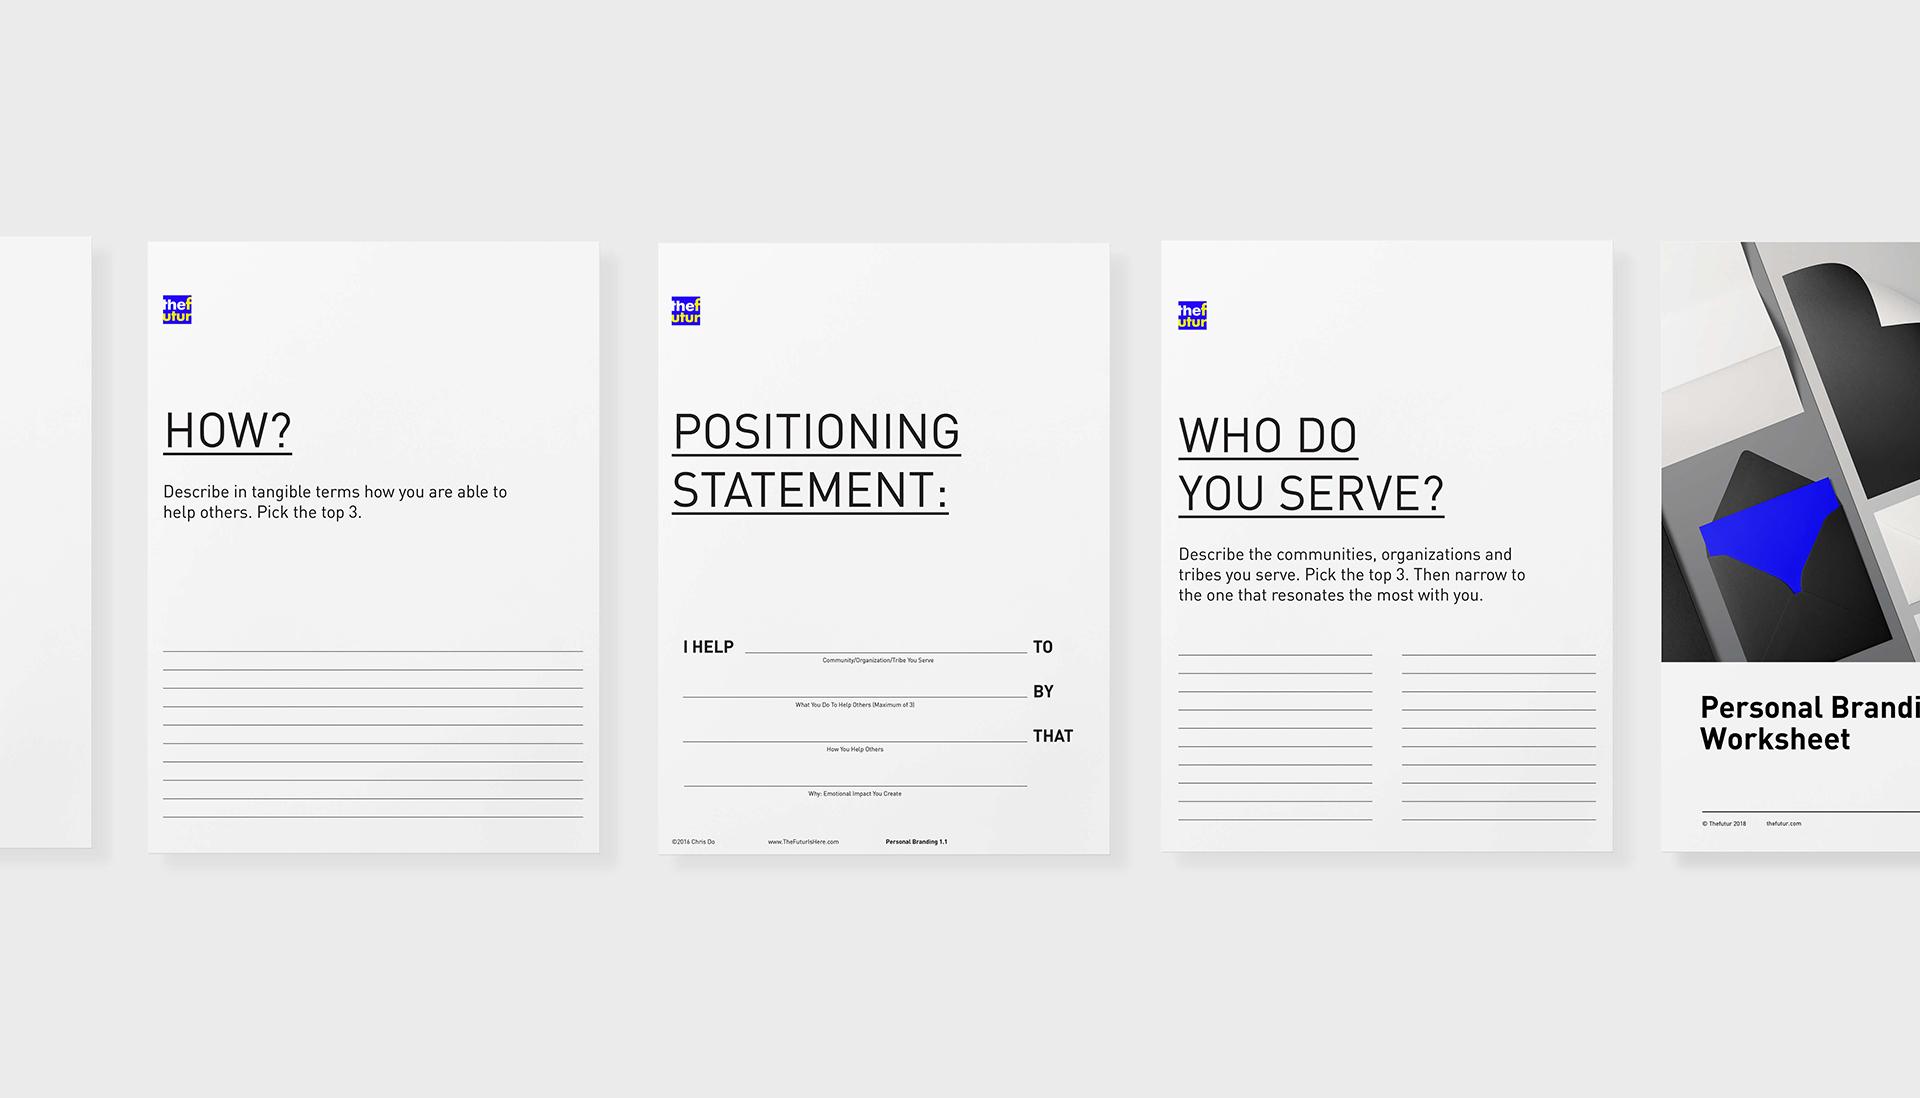 Personal Branding Worksheet Free Download The Futur